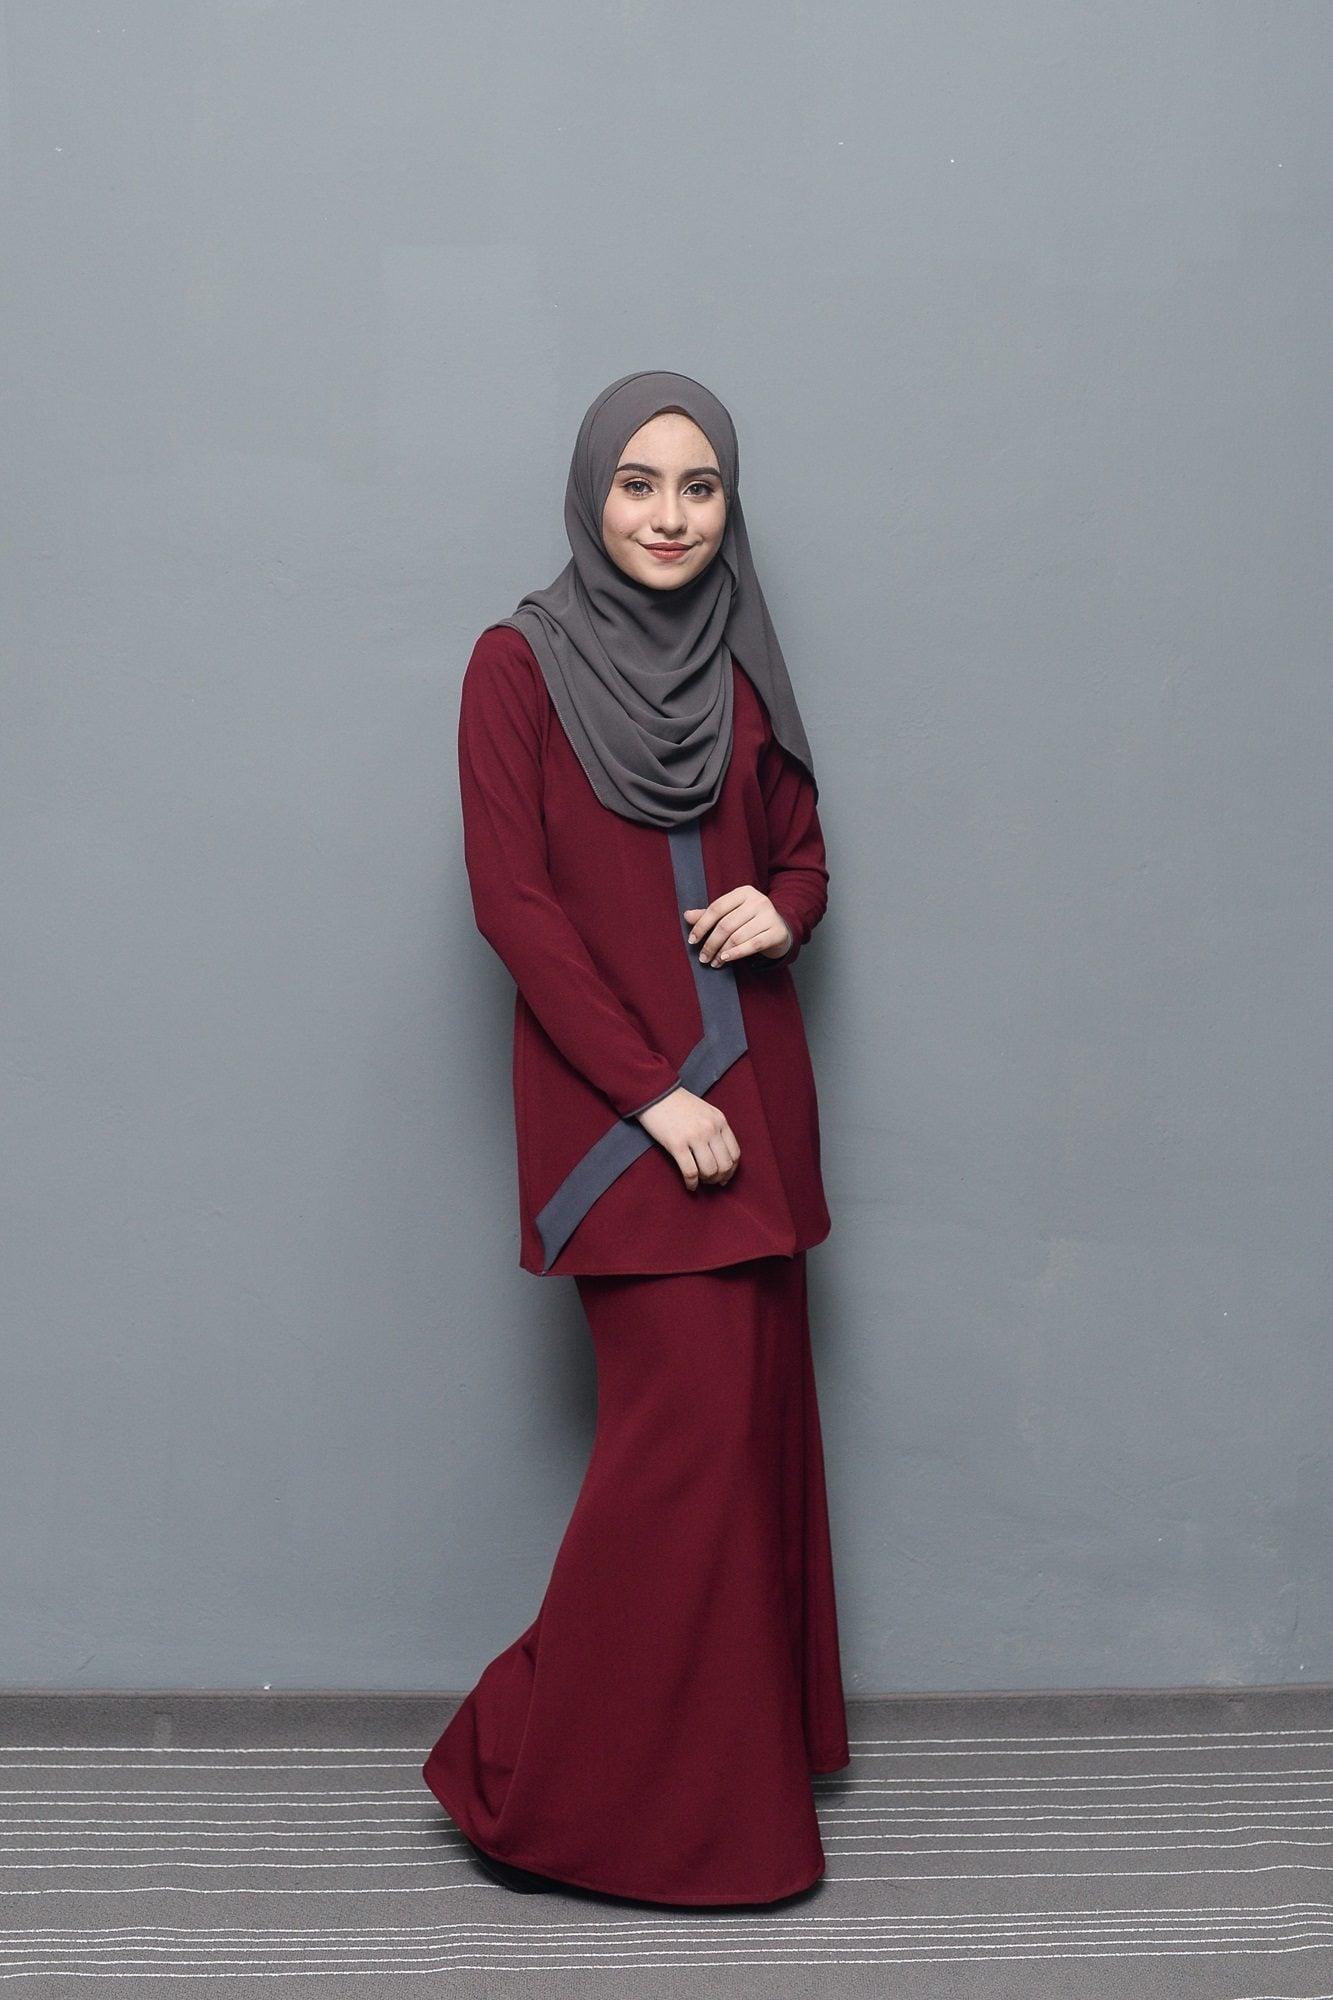 Wanita Asia memakai hijab warna abu-abu.